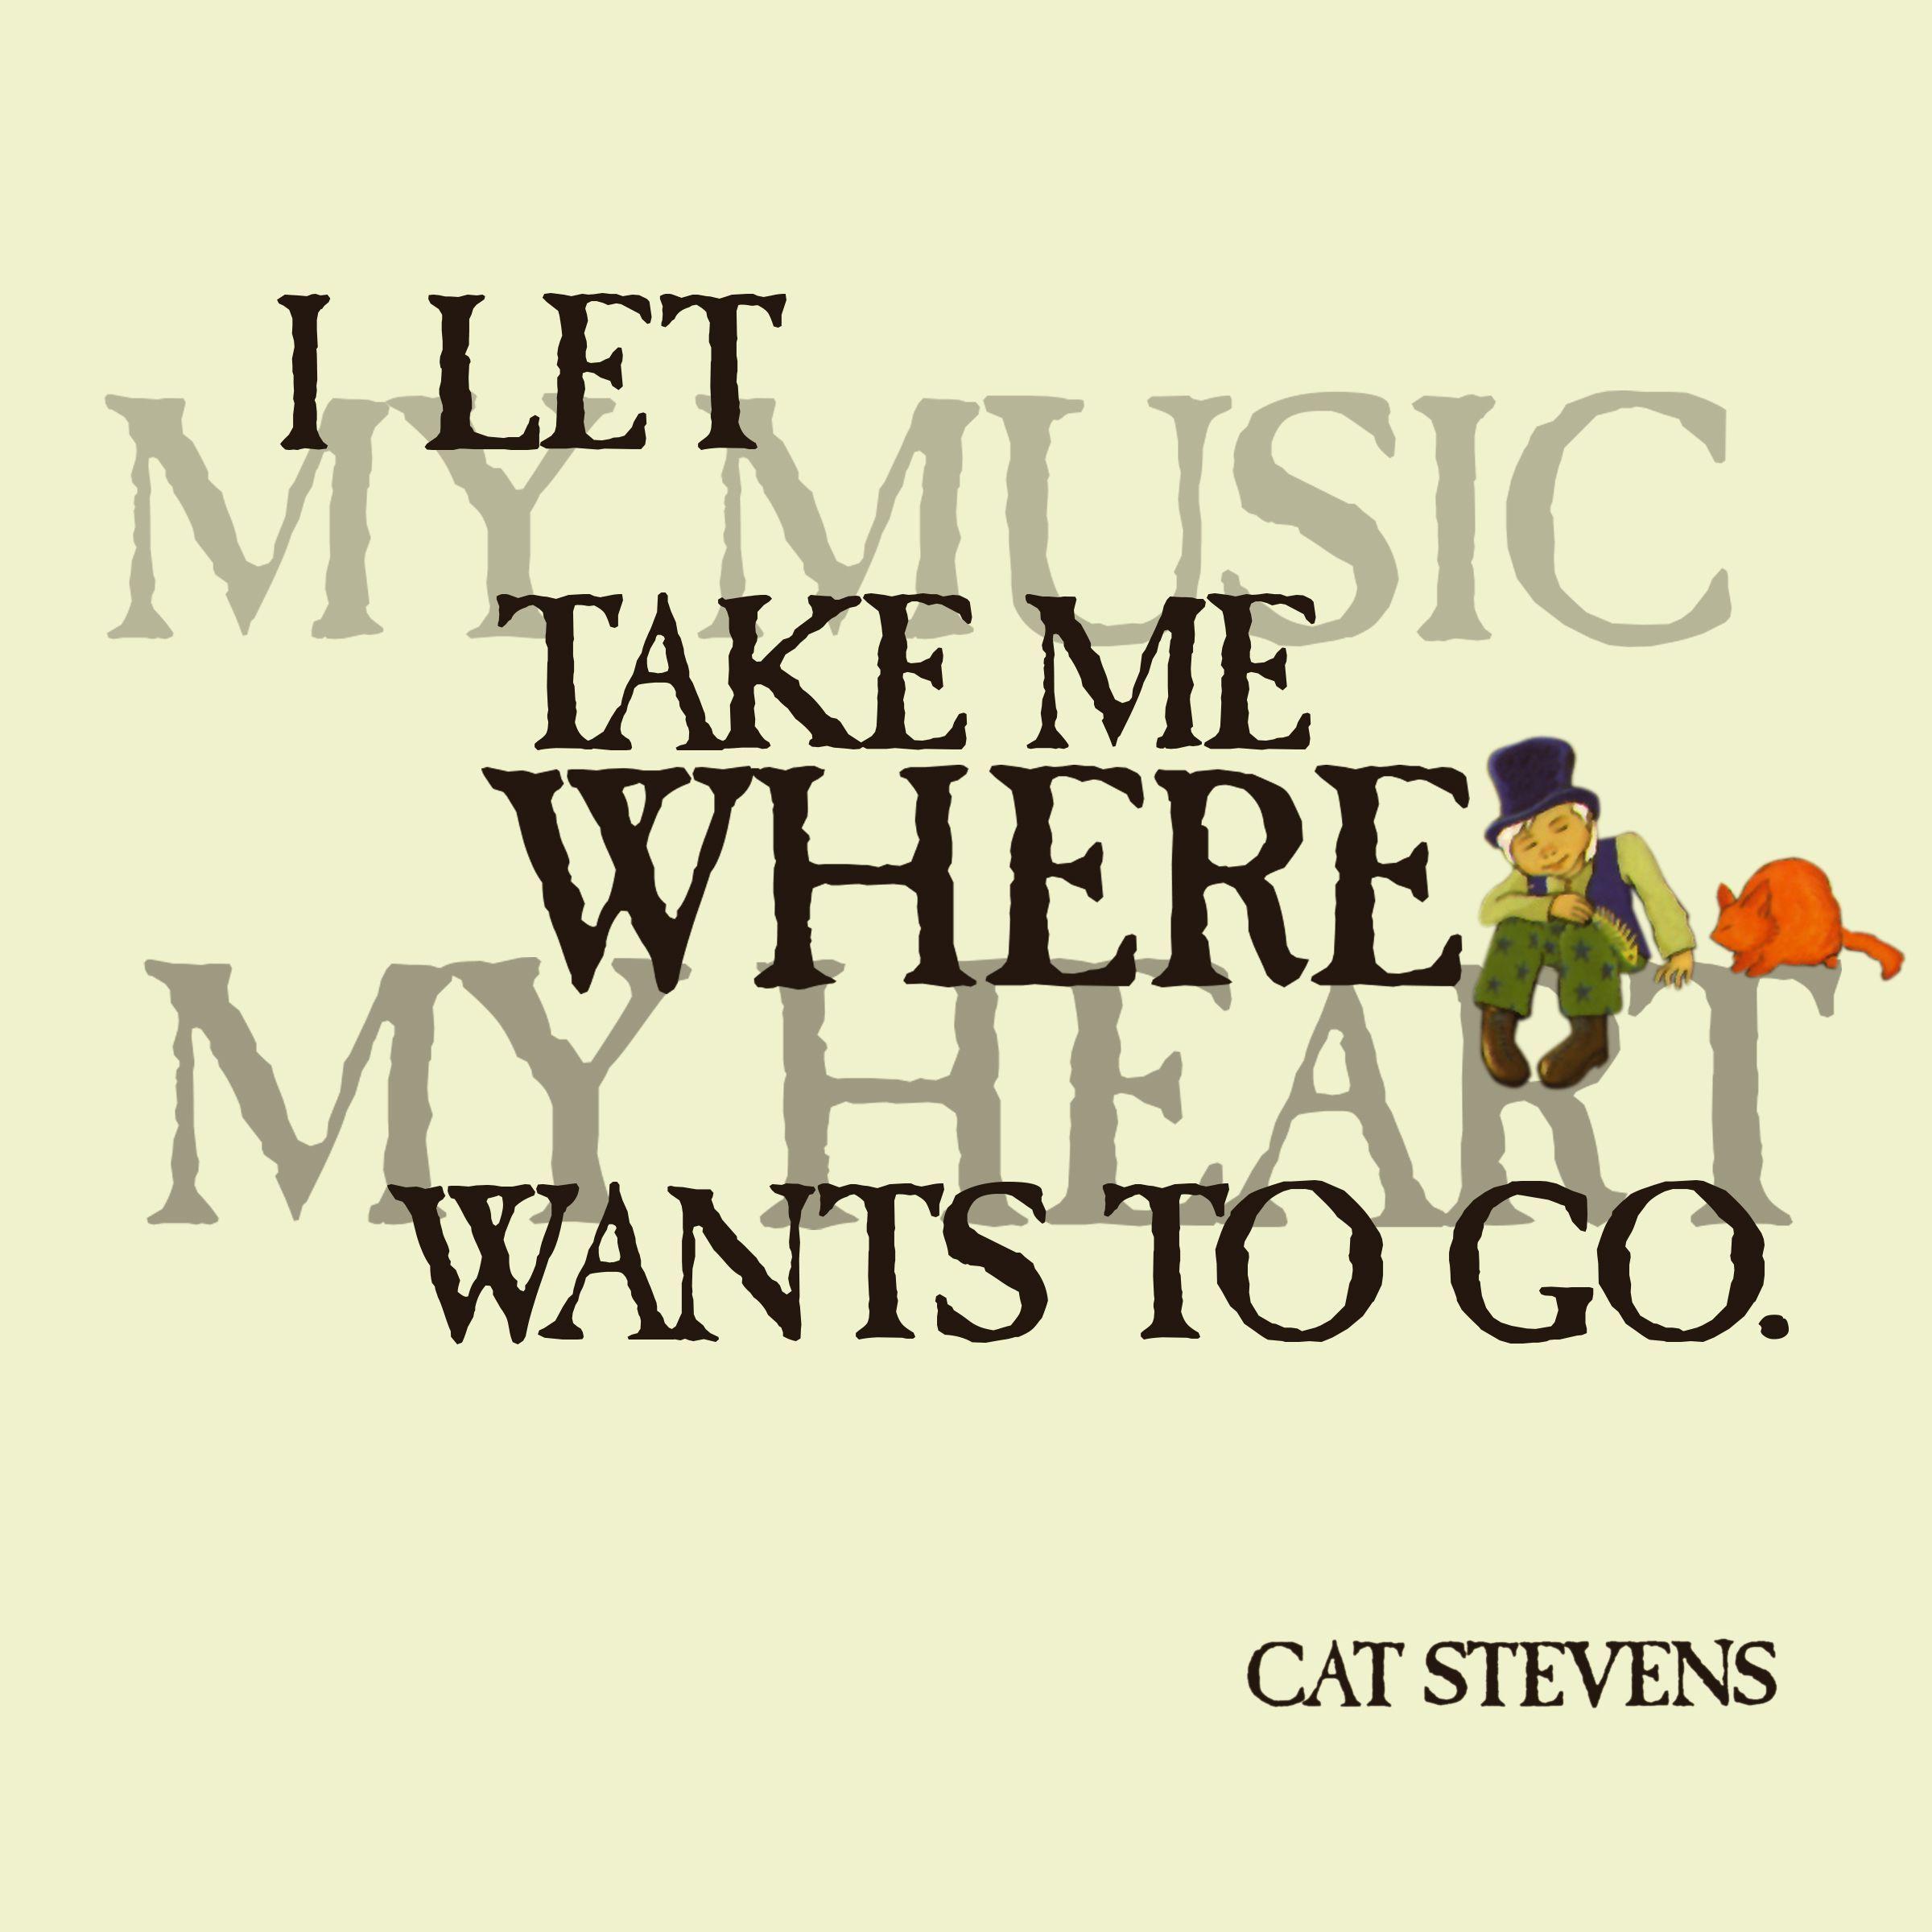 Cat Stevens lyric. Cat stevens lyrics, Cat stevens